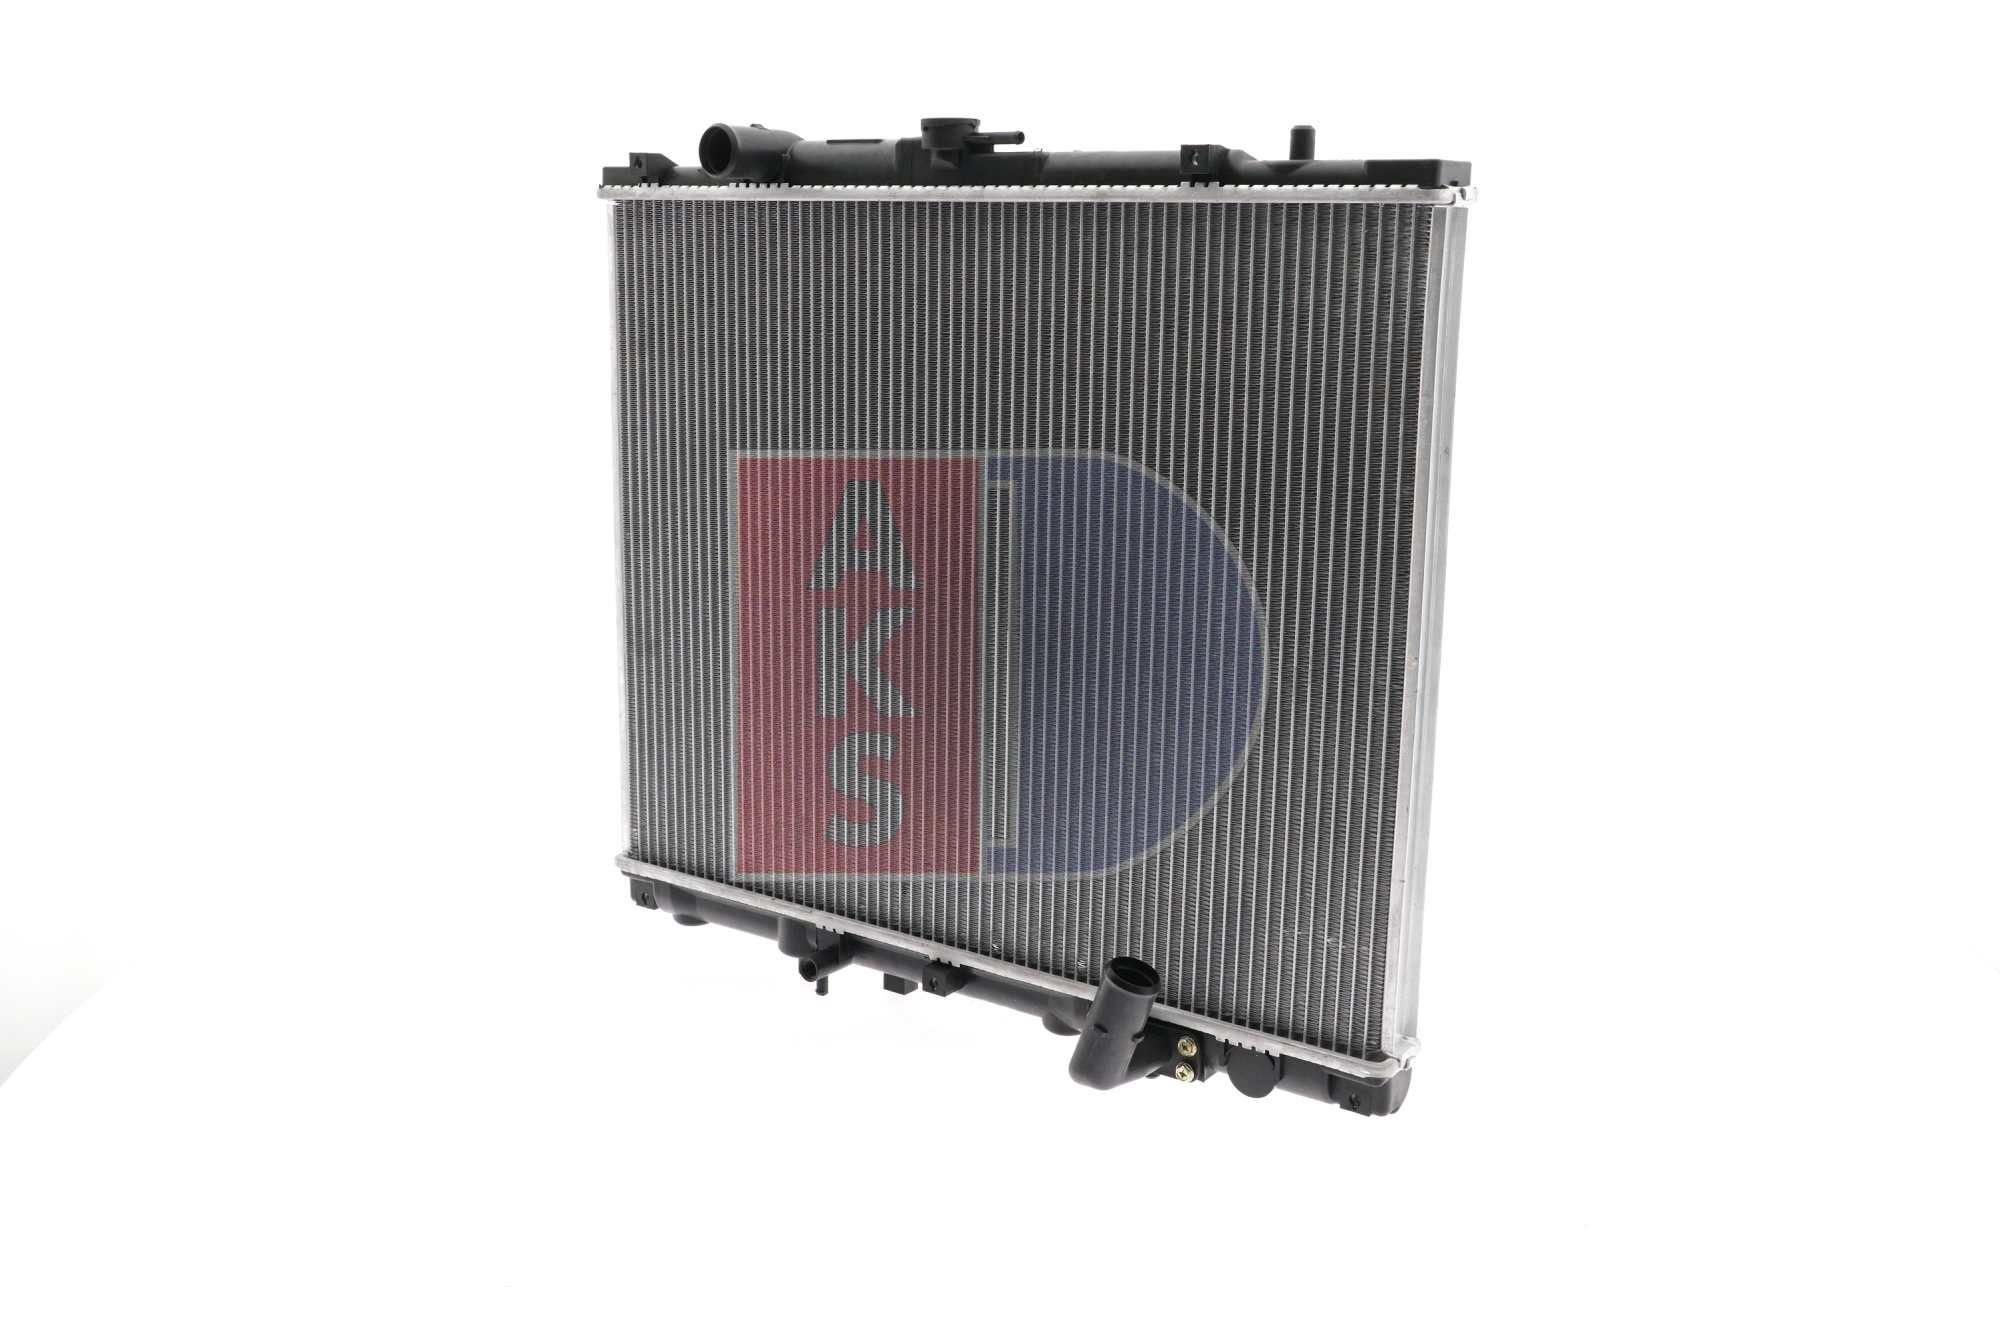 140017N AKS DASIS Kühlrippen gelötet Netzmaße: 500x639x36 Kühler, Motorkühlung 140017N günstig kaufen